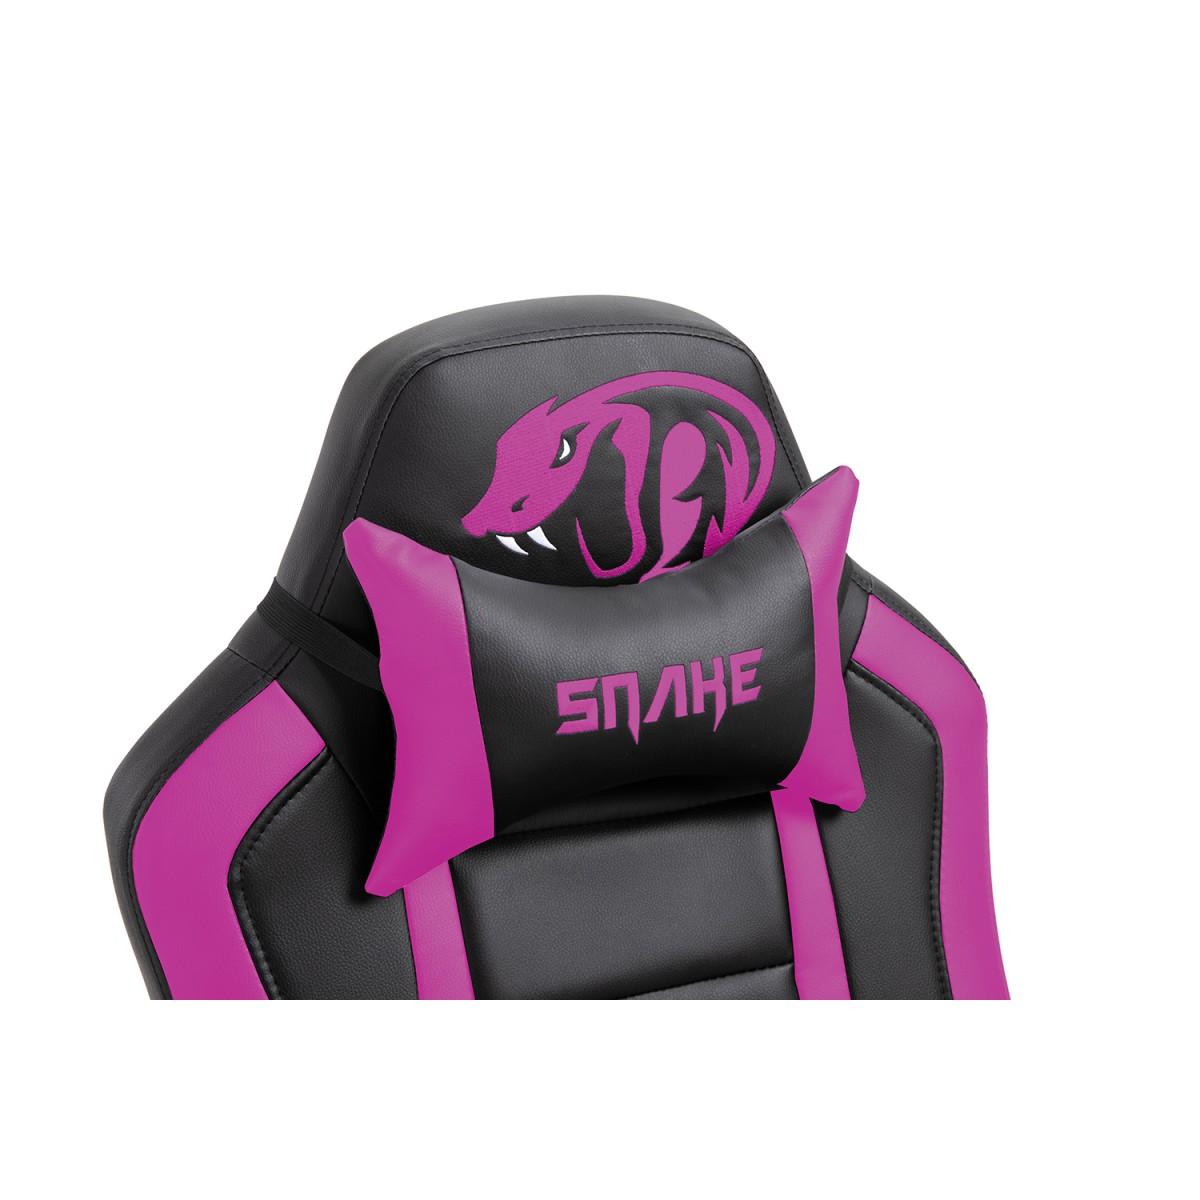 Cadeira Gamer Snake Viper II, Black/Pink, 4044